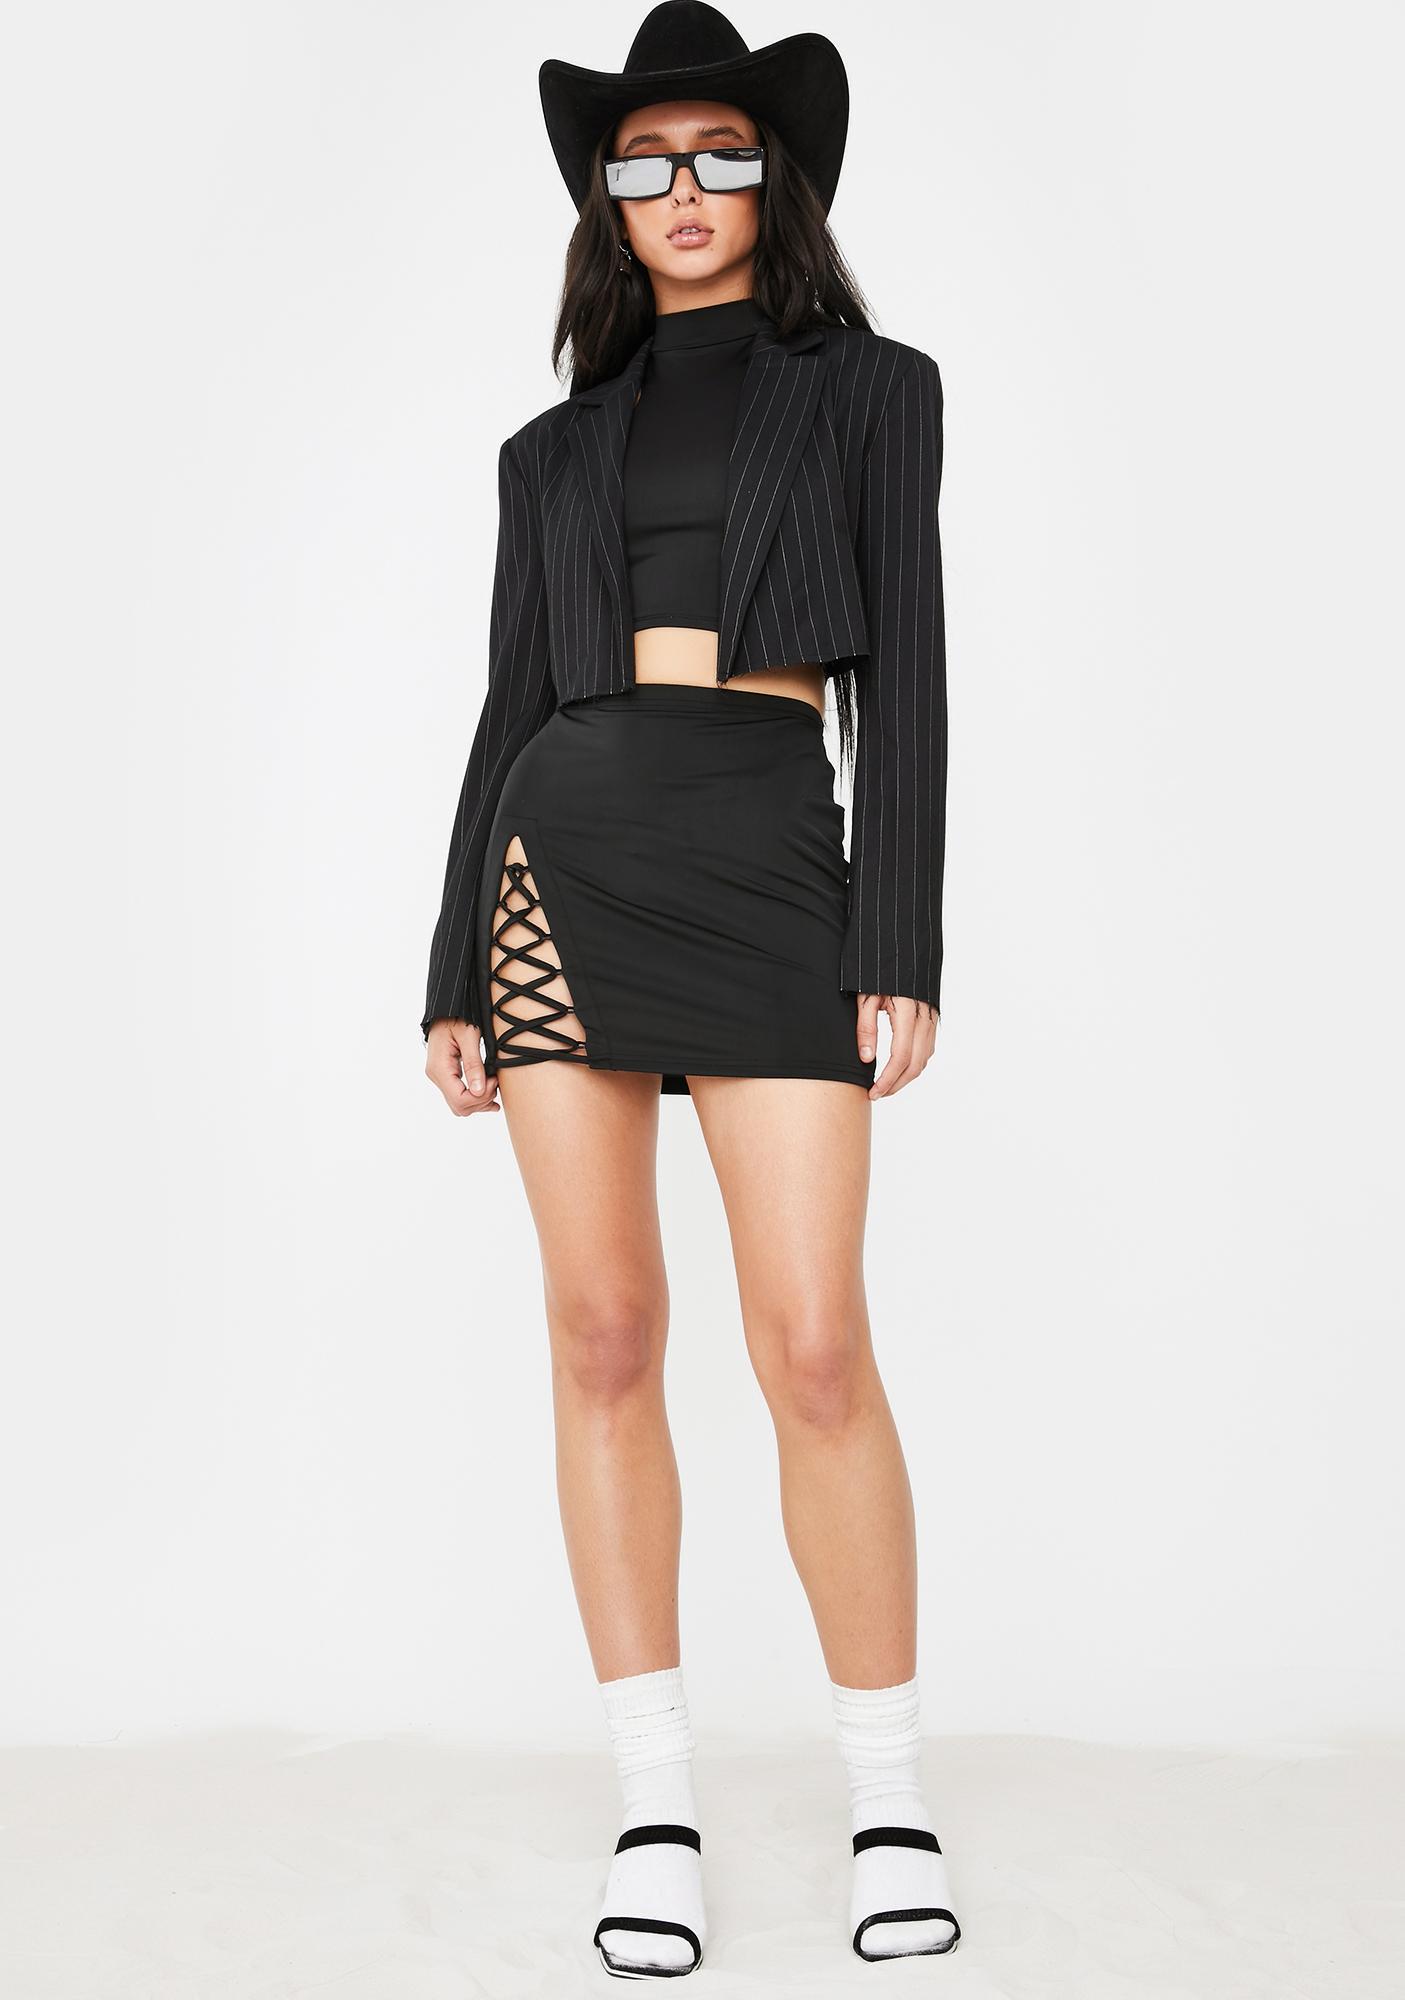 Poster Grl Likes On Likes Mini Skirt